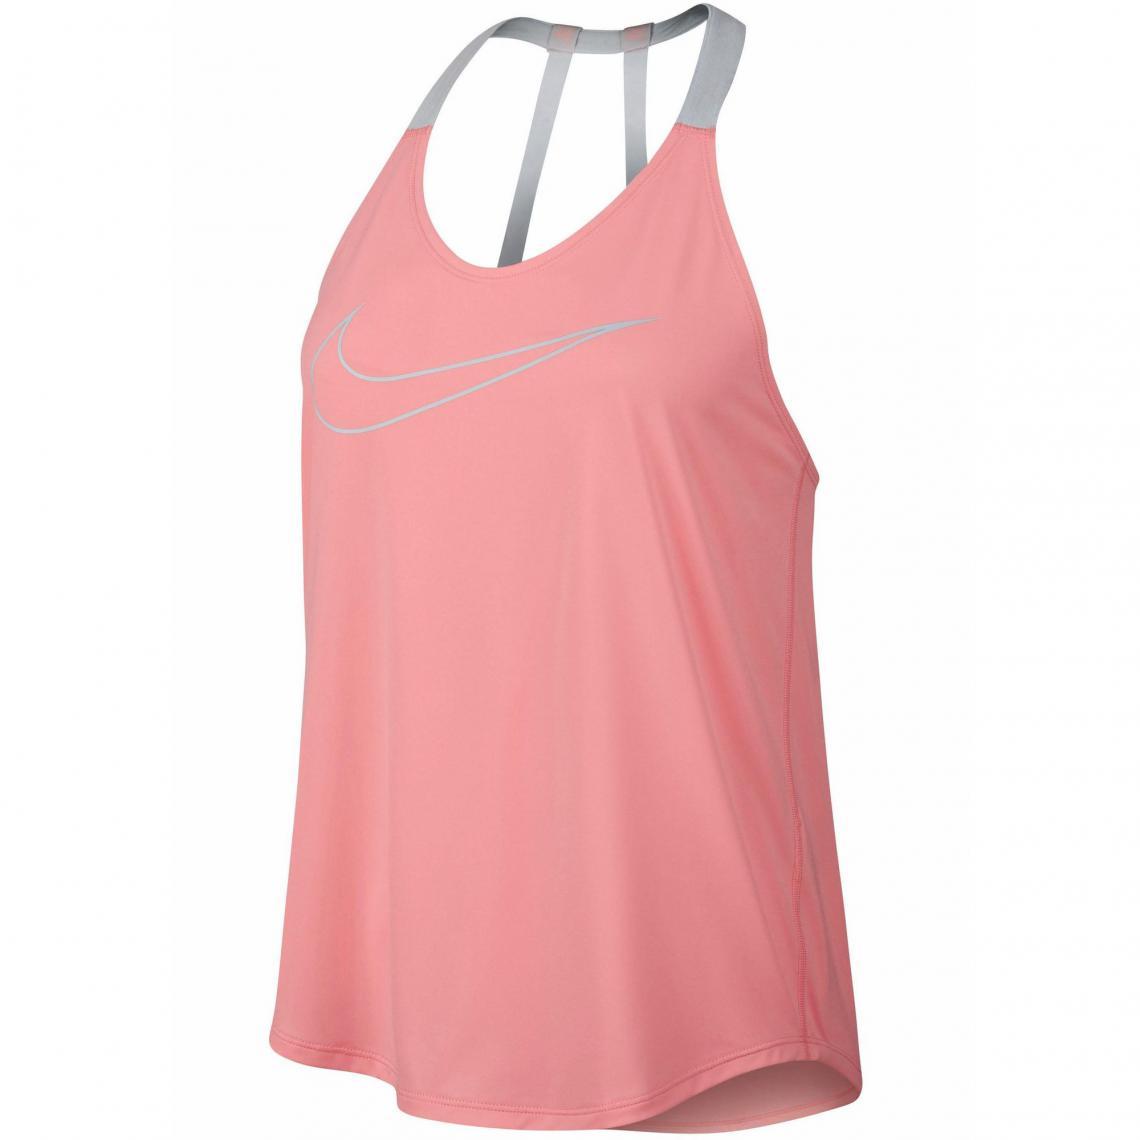 promo code f599d 518c6 Débardeur femme Dri-FIT Nike Dry Elastika GRX - Vert Nike Femme